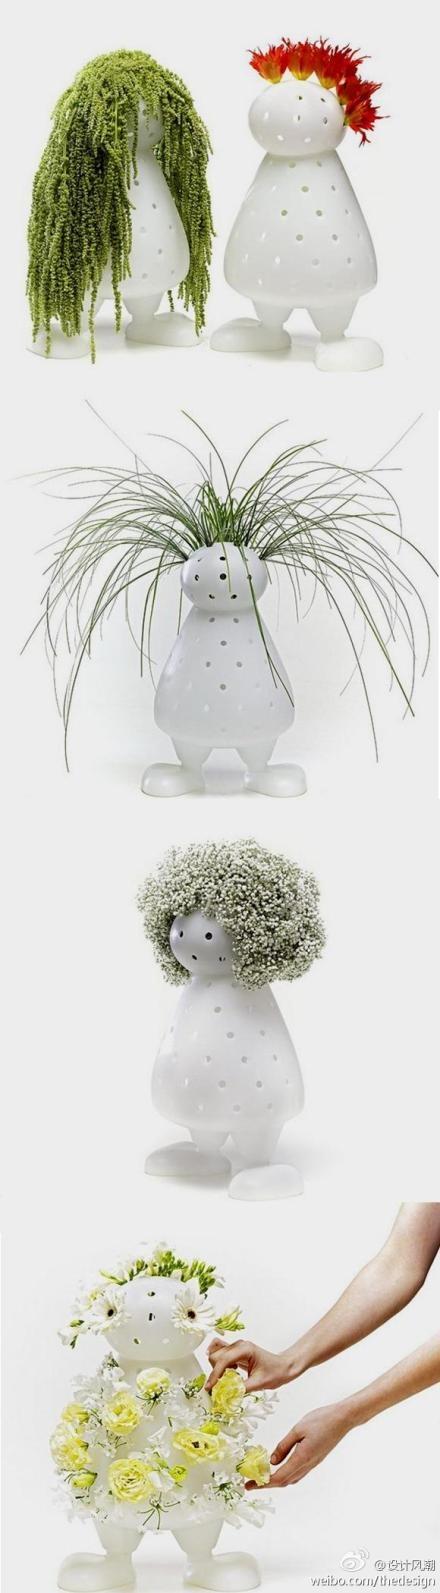 Very Cool Vase Design